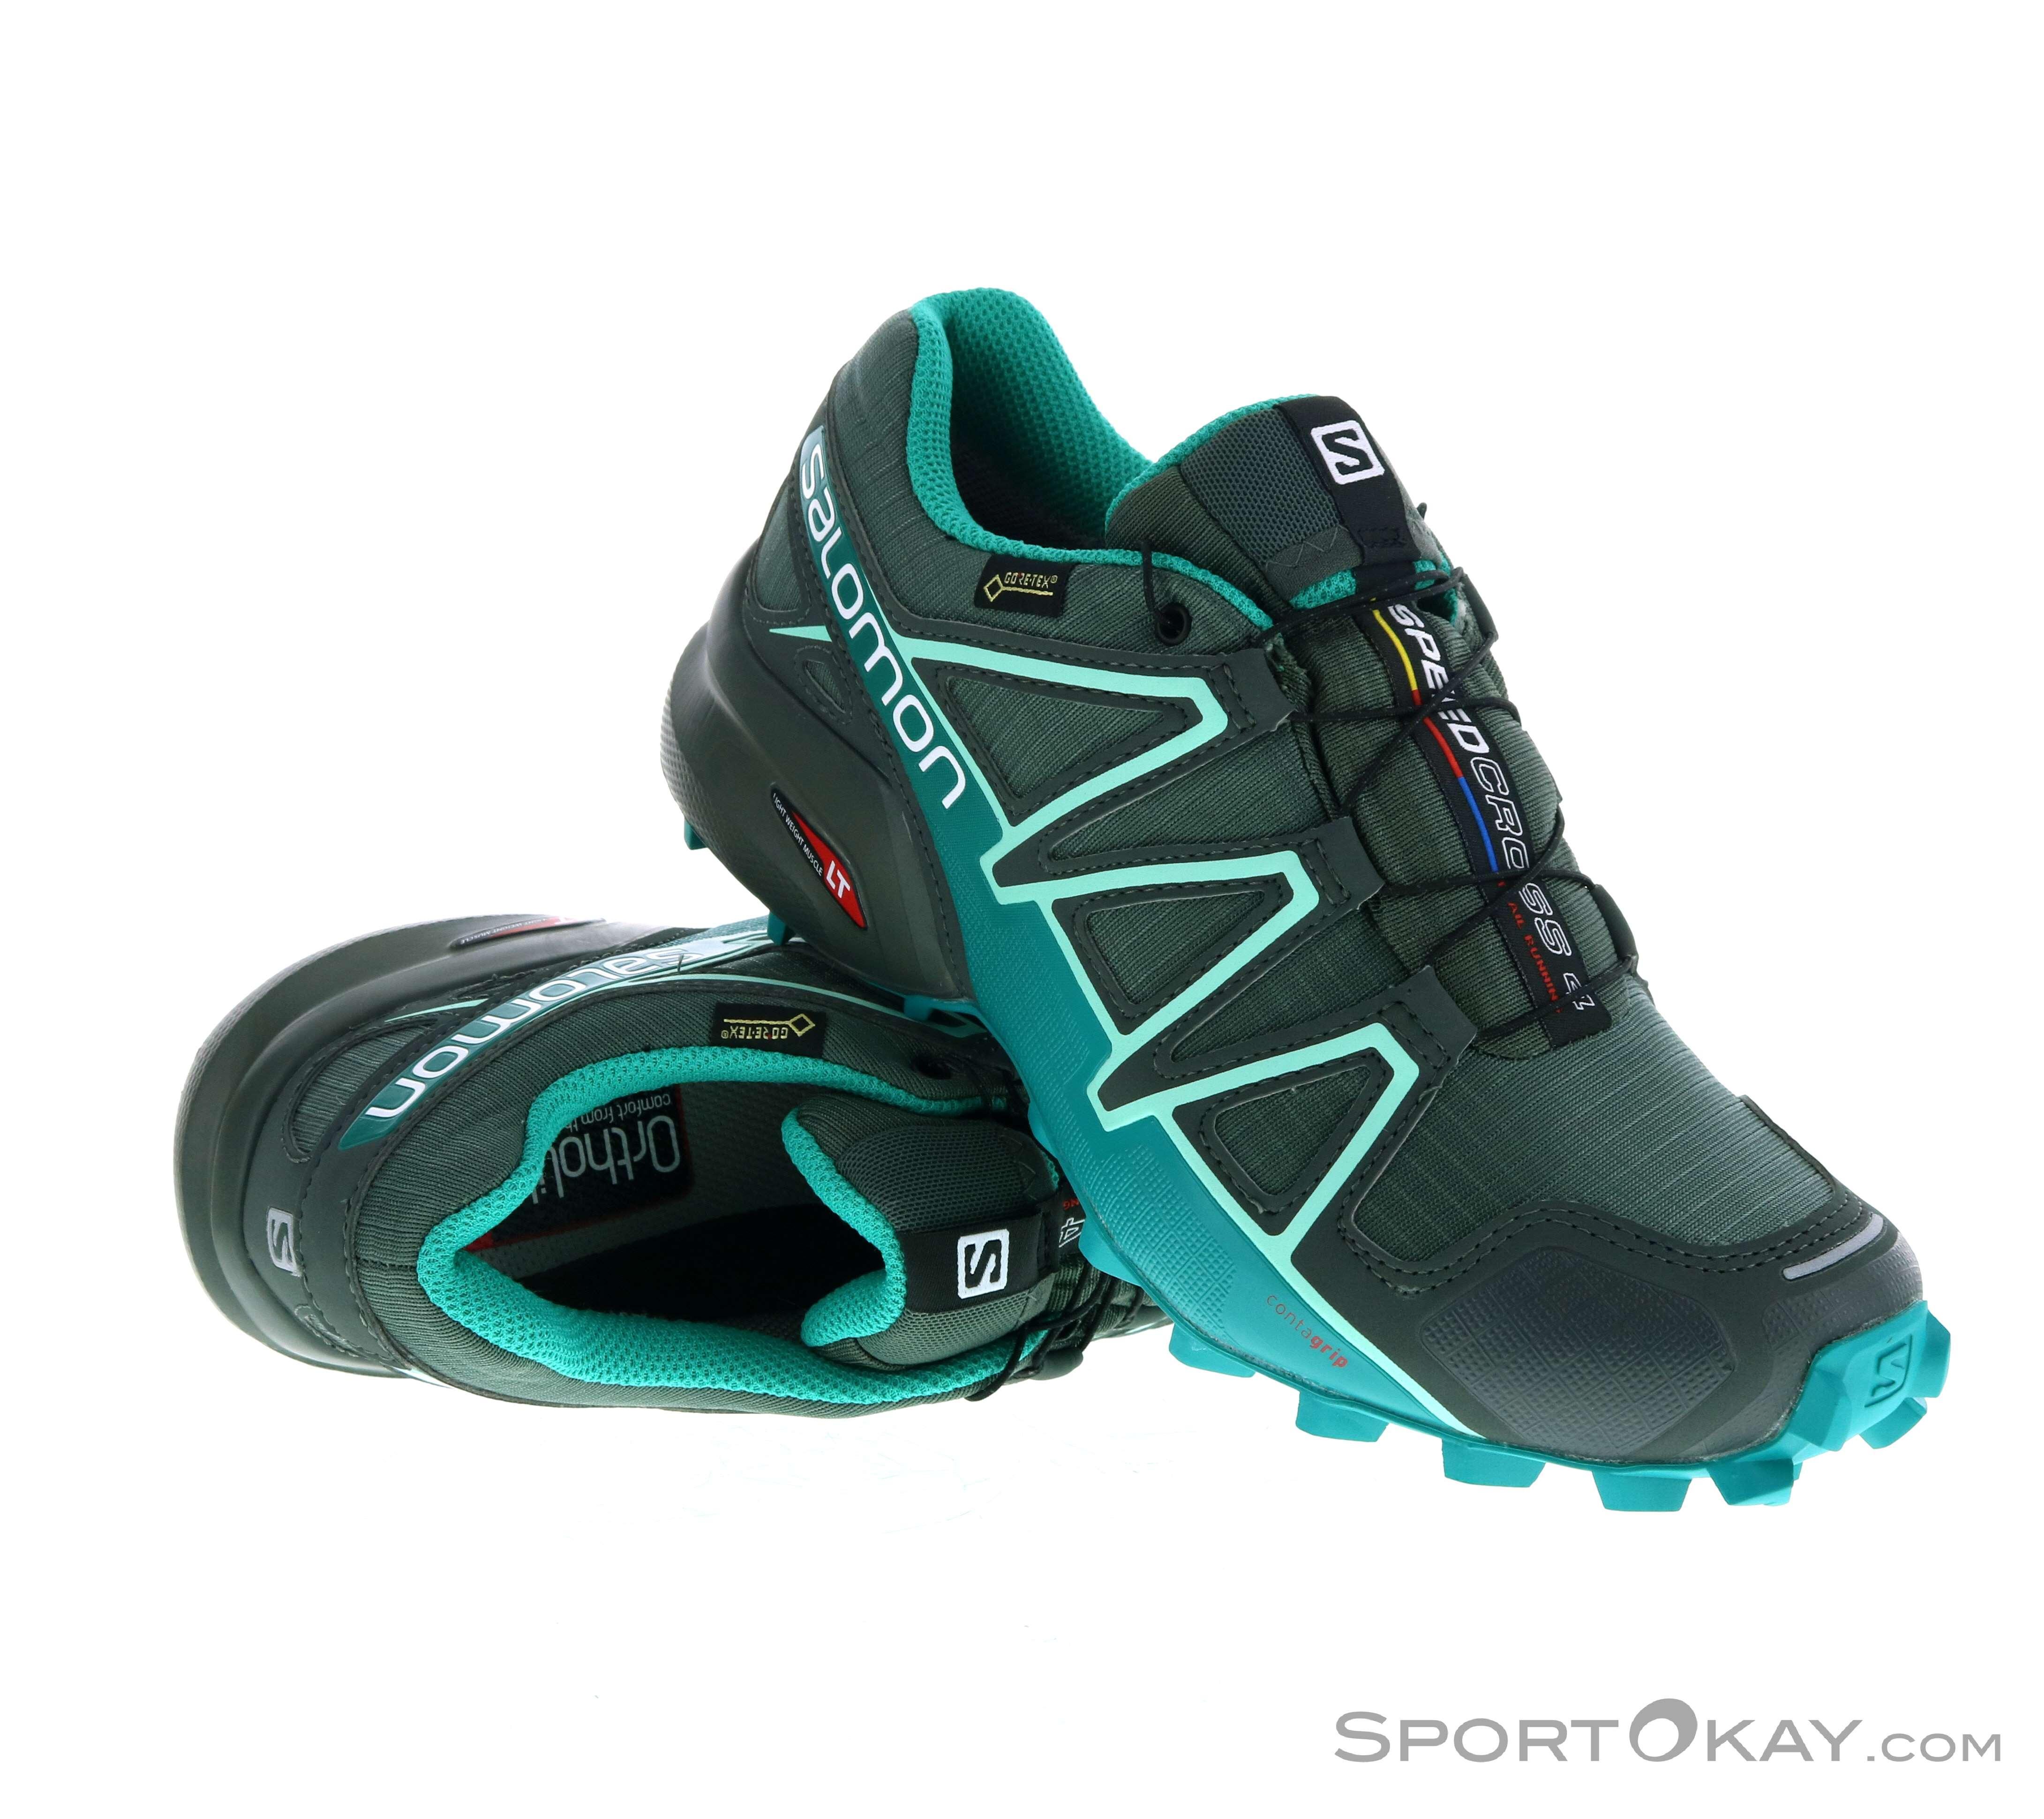 Salomon Speedcross 4 GTX Damen Traillaufschuhe Gore Tex 1TkyH